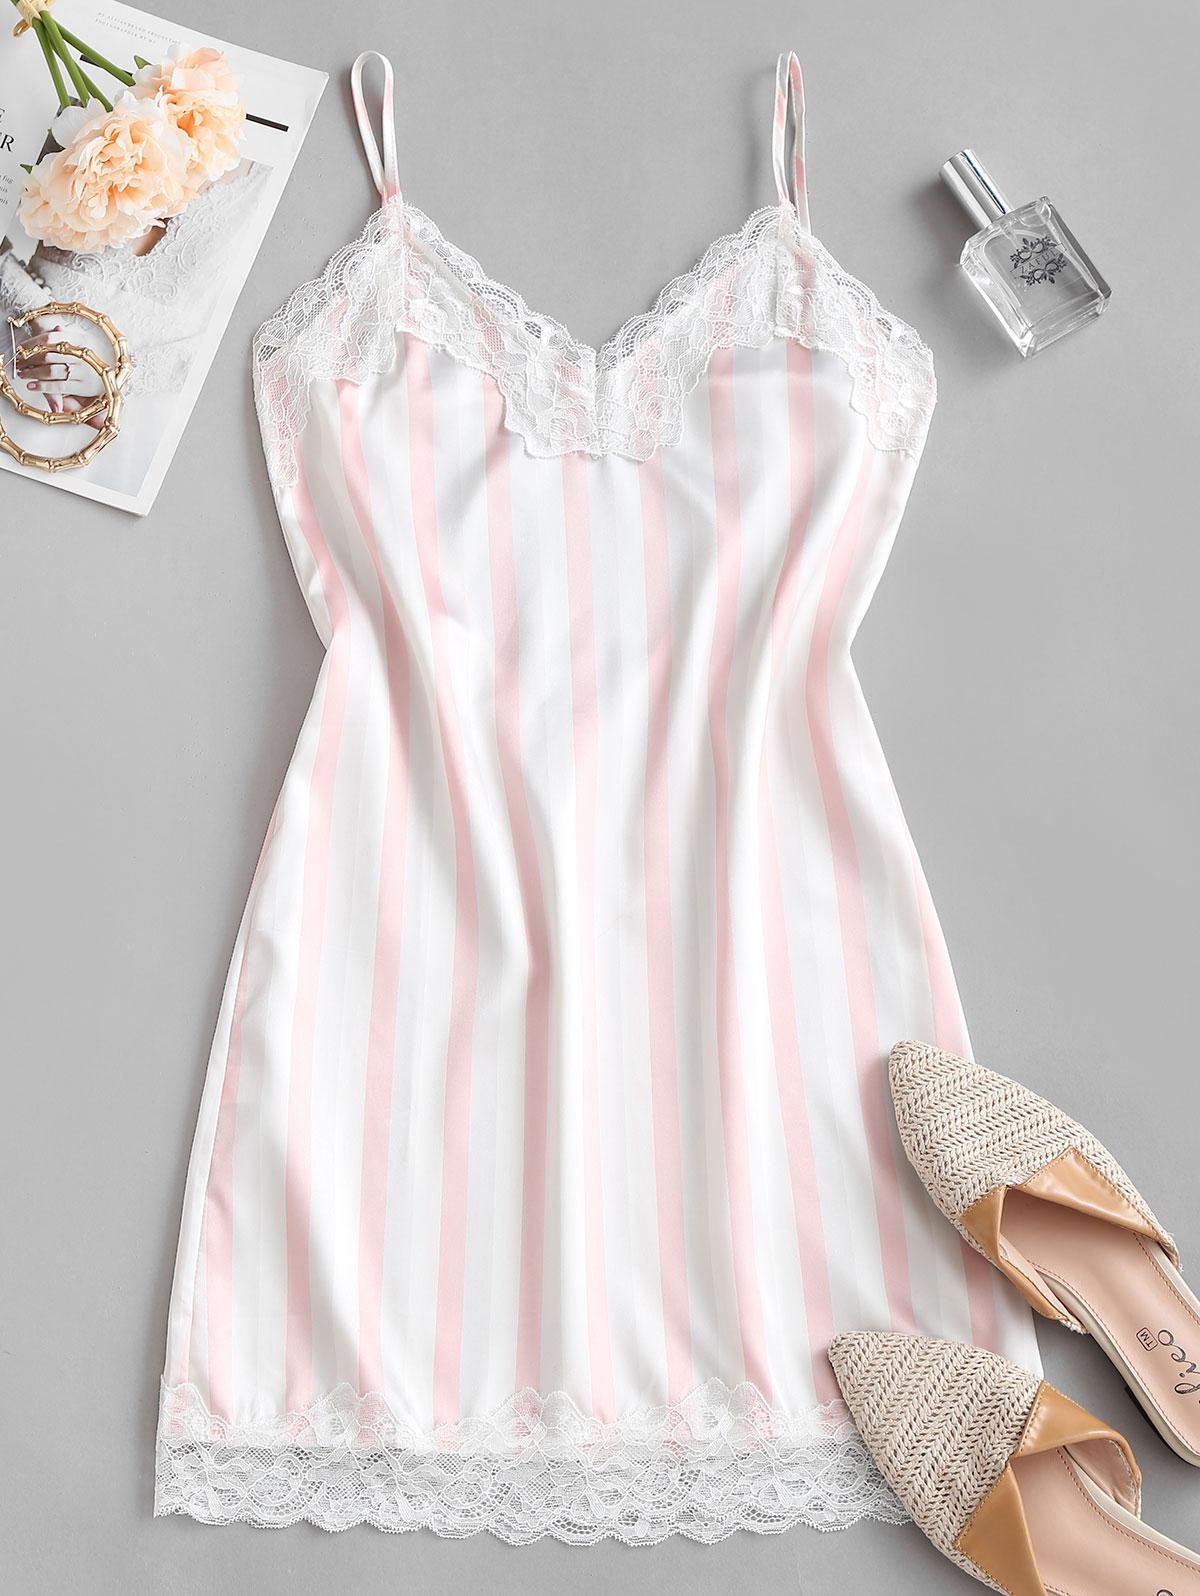 Scalloped Lace Trim Stripes Satin Chemise